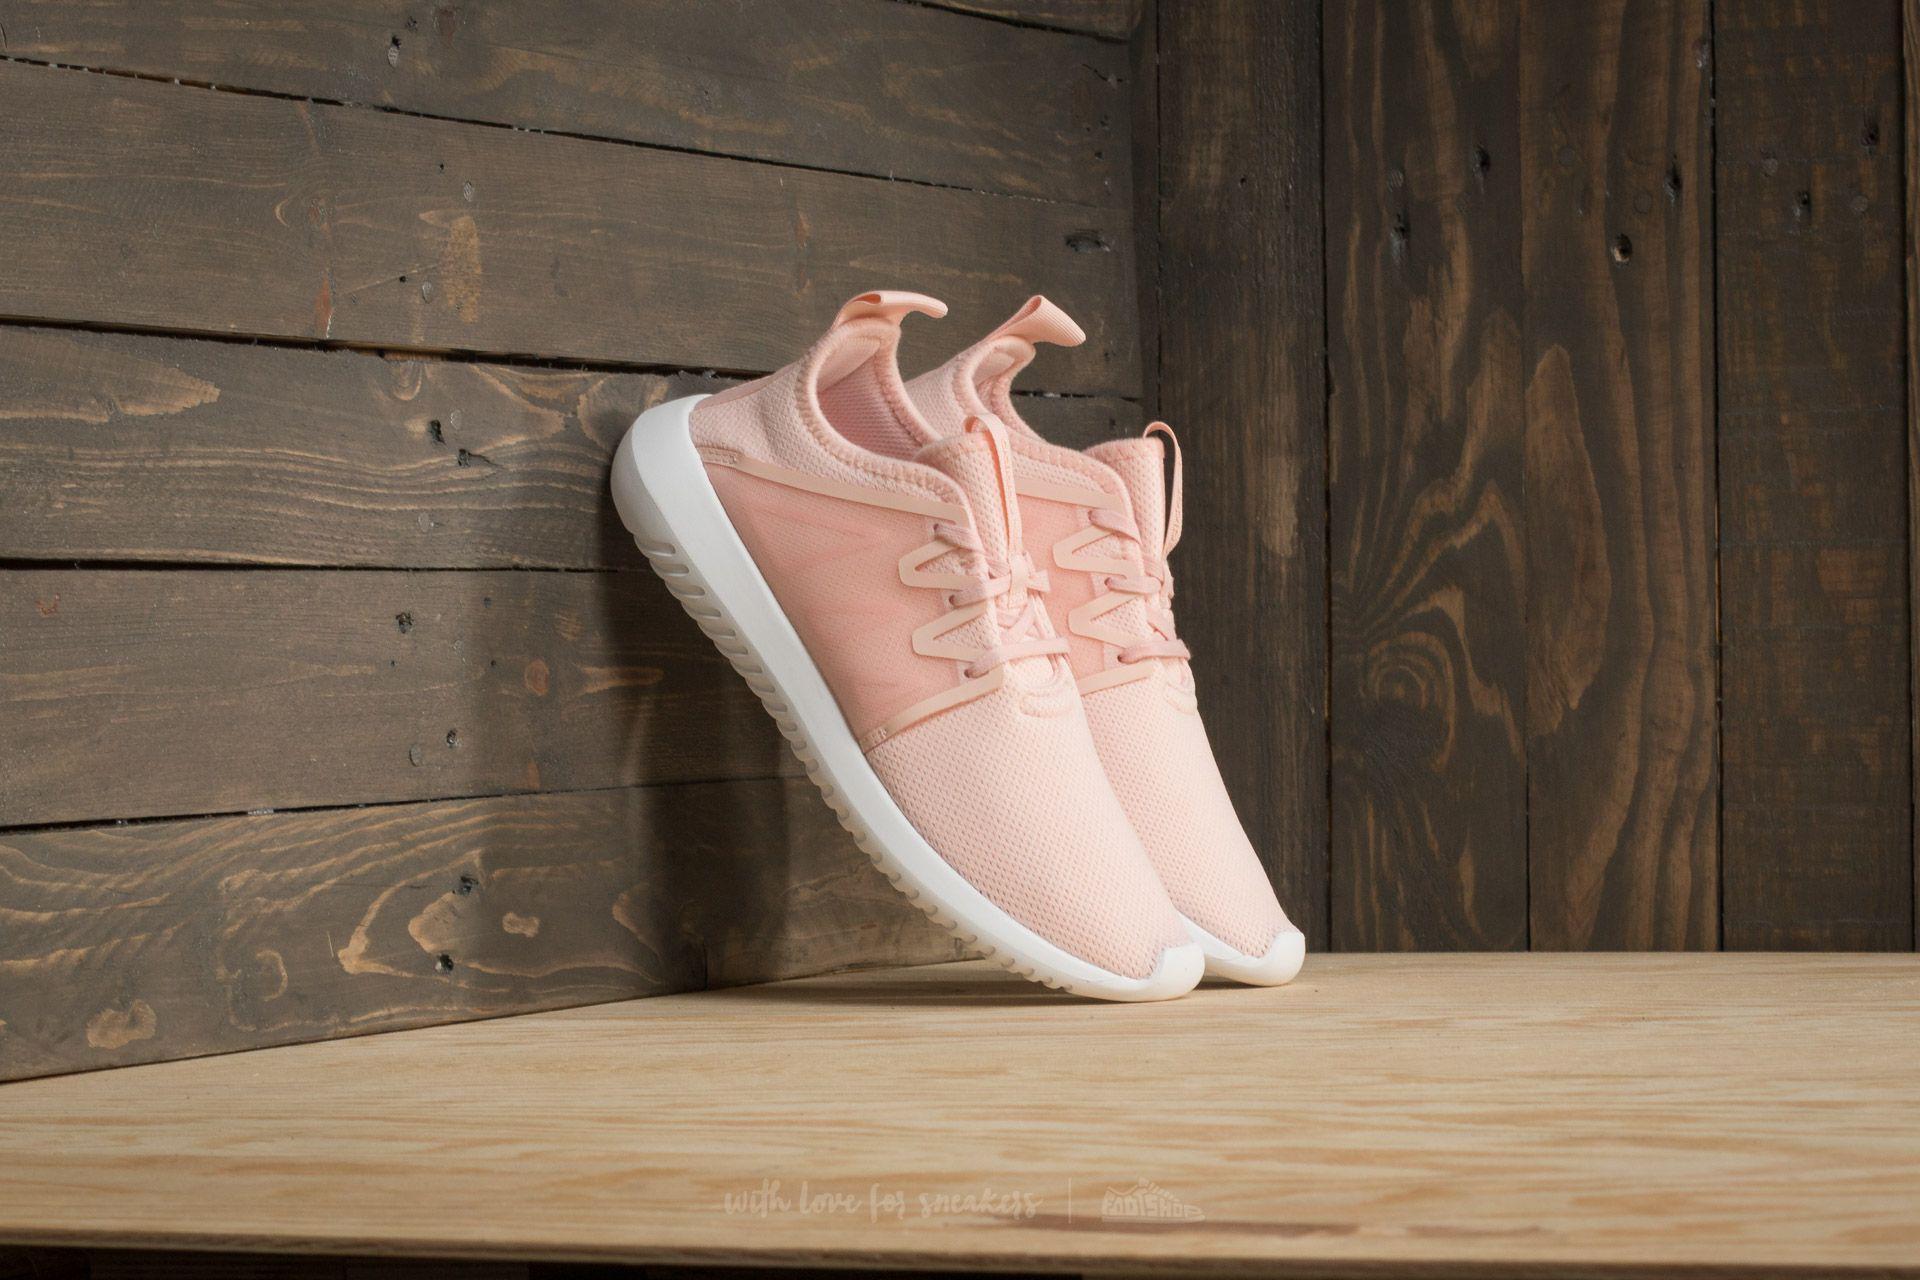 lyst adidas originali adidas tubulare virale w ghiaccio rosa / ghiaccio